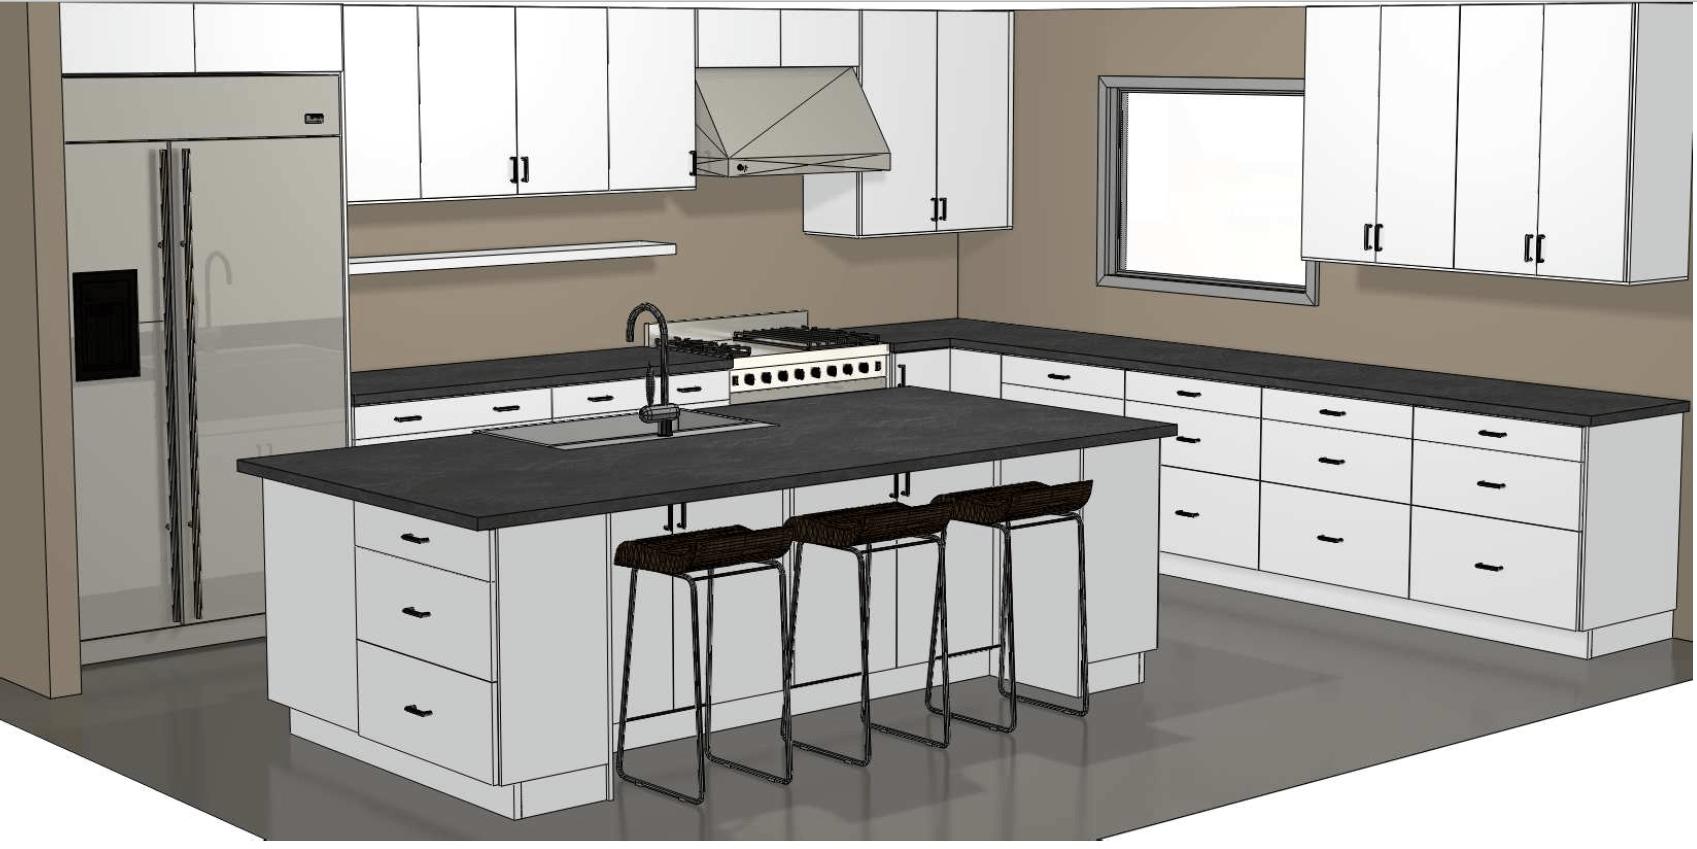 kitchen samples unassembled cabinets sample designs modern family kitchens 16 x 14 png